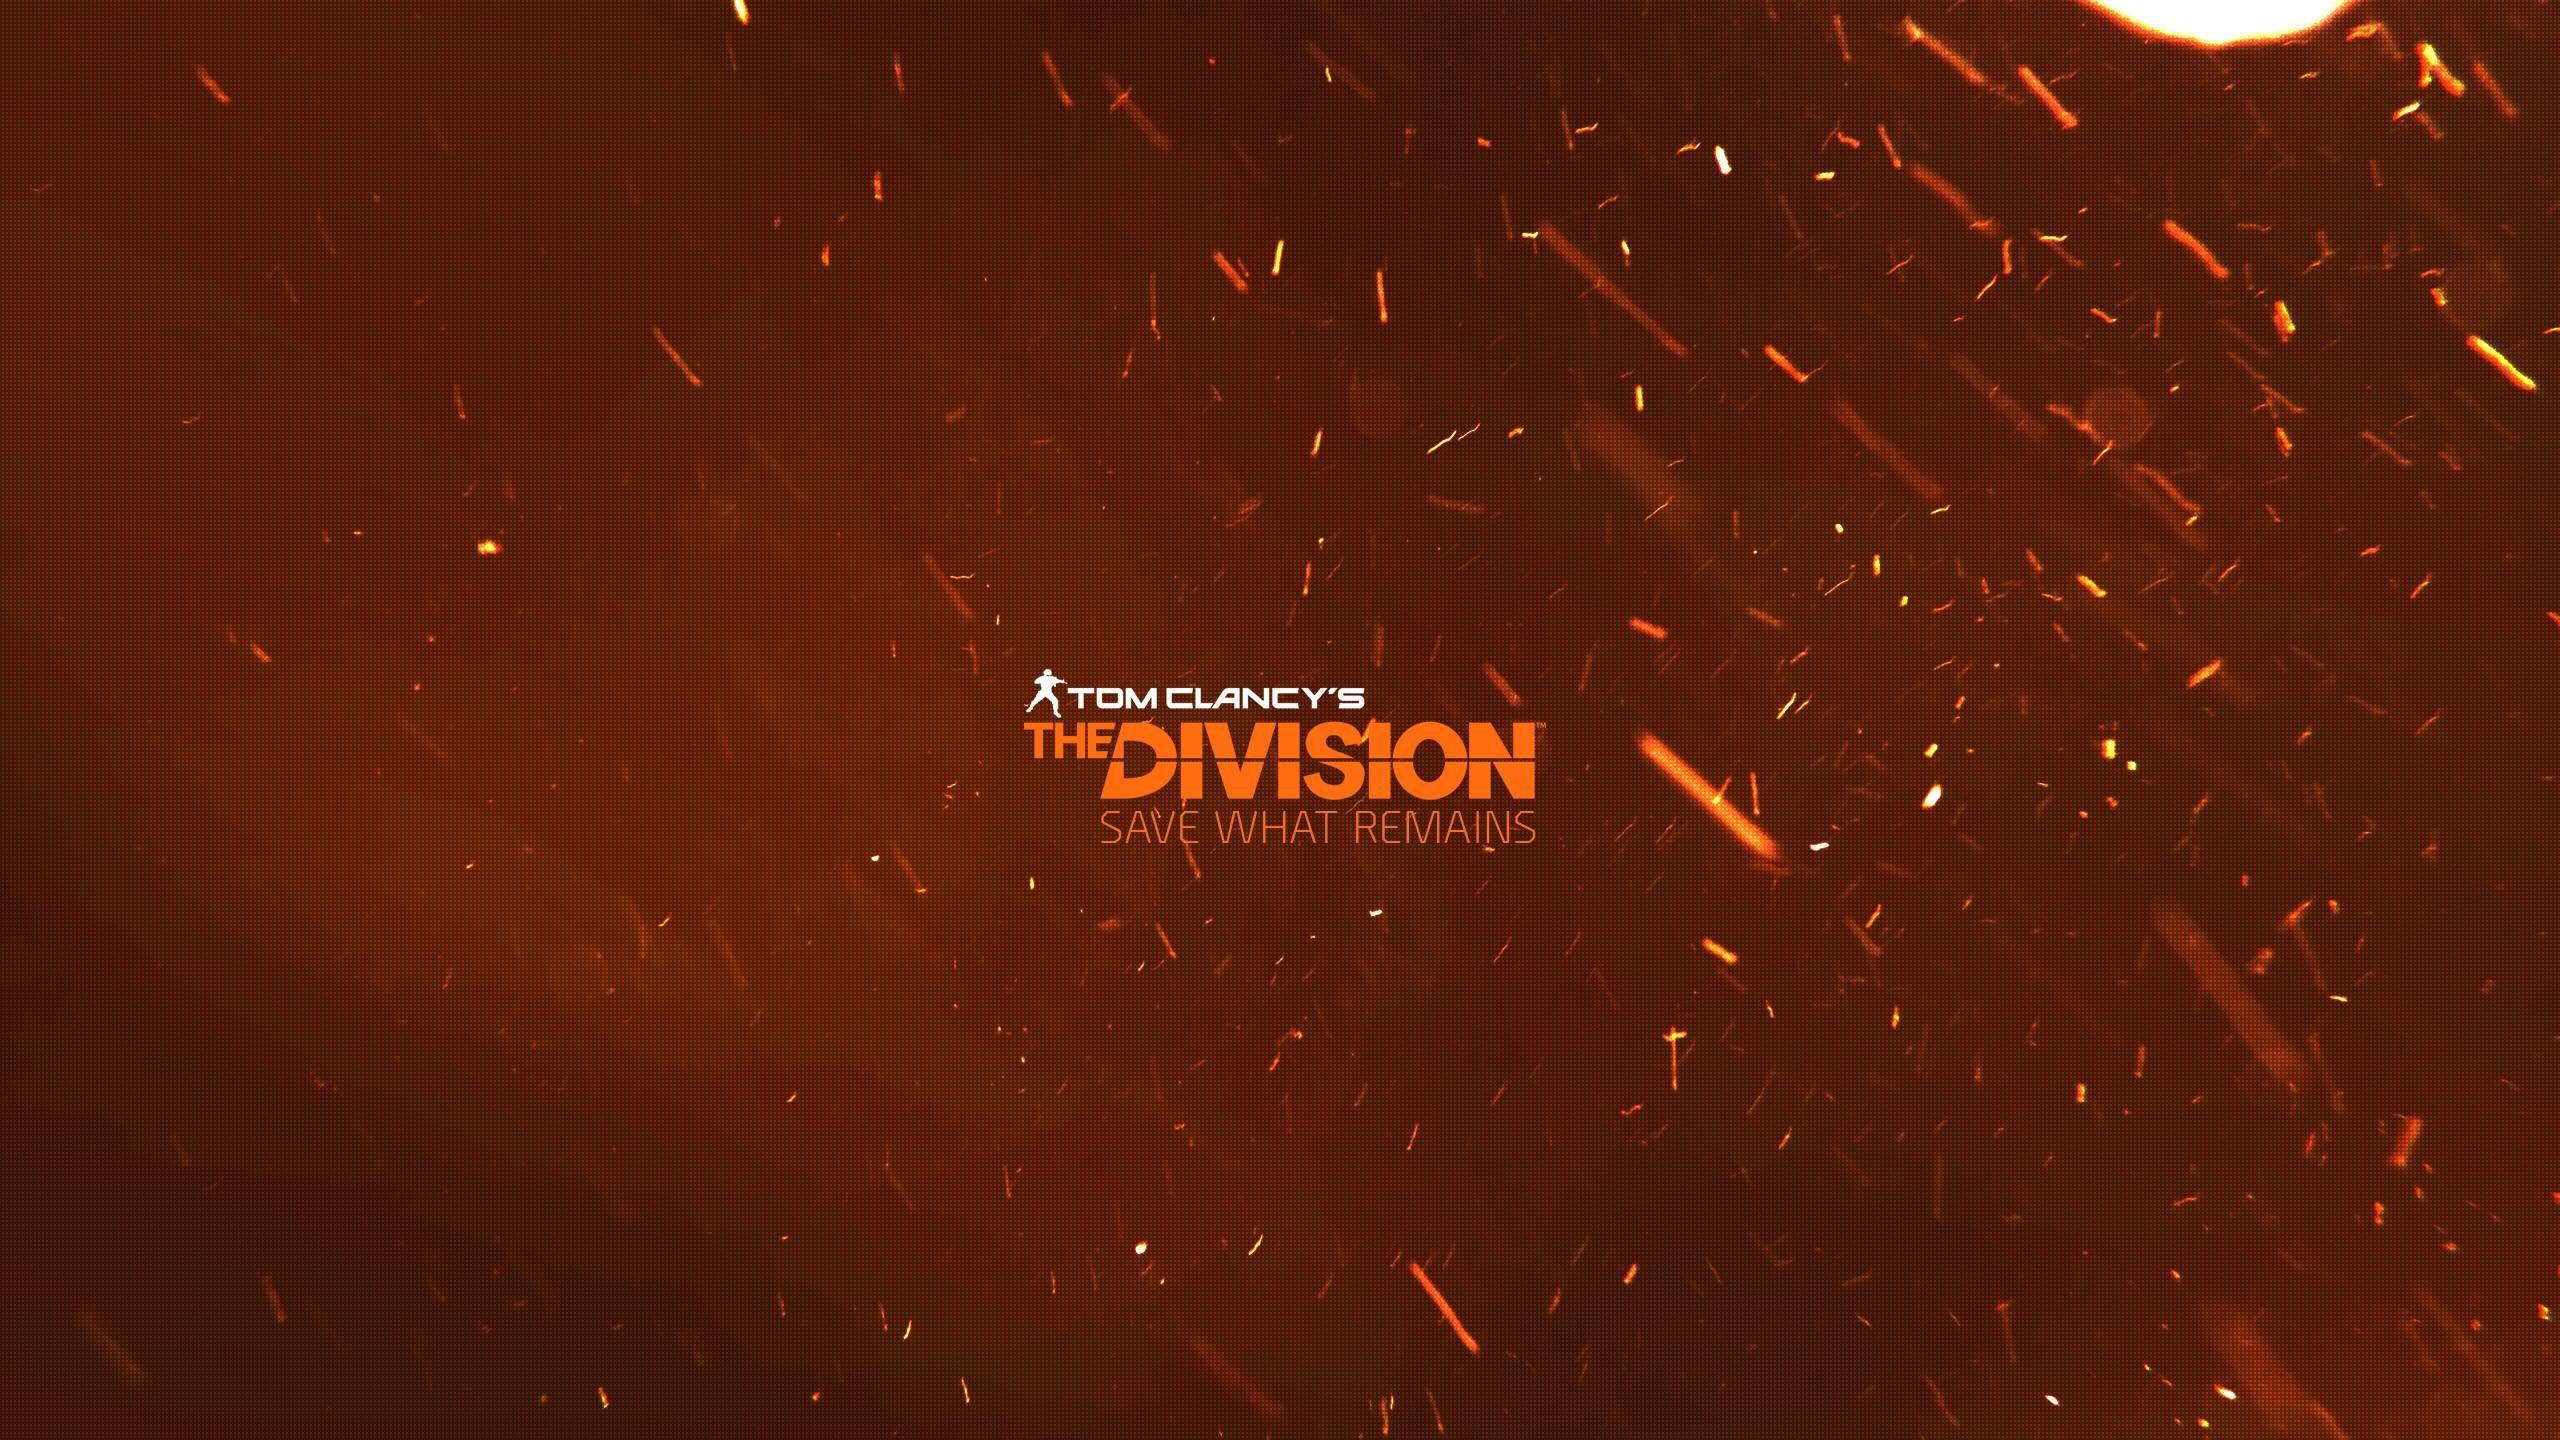 The Division – https://i.imgur.com/xeisPto.jpg